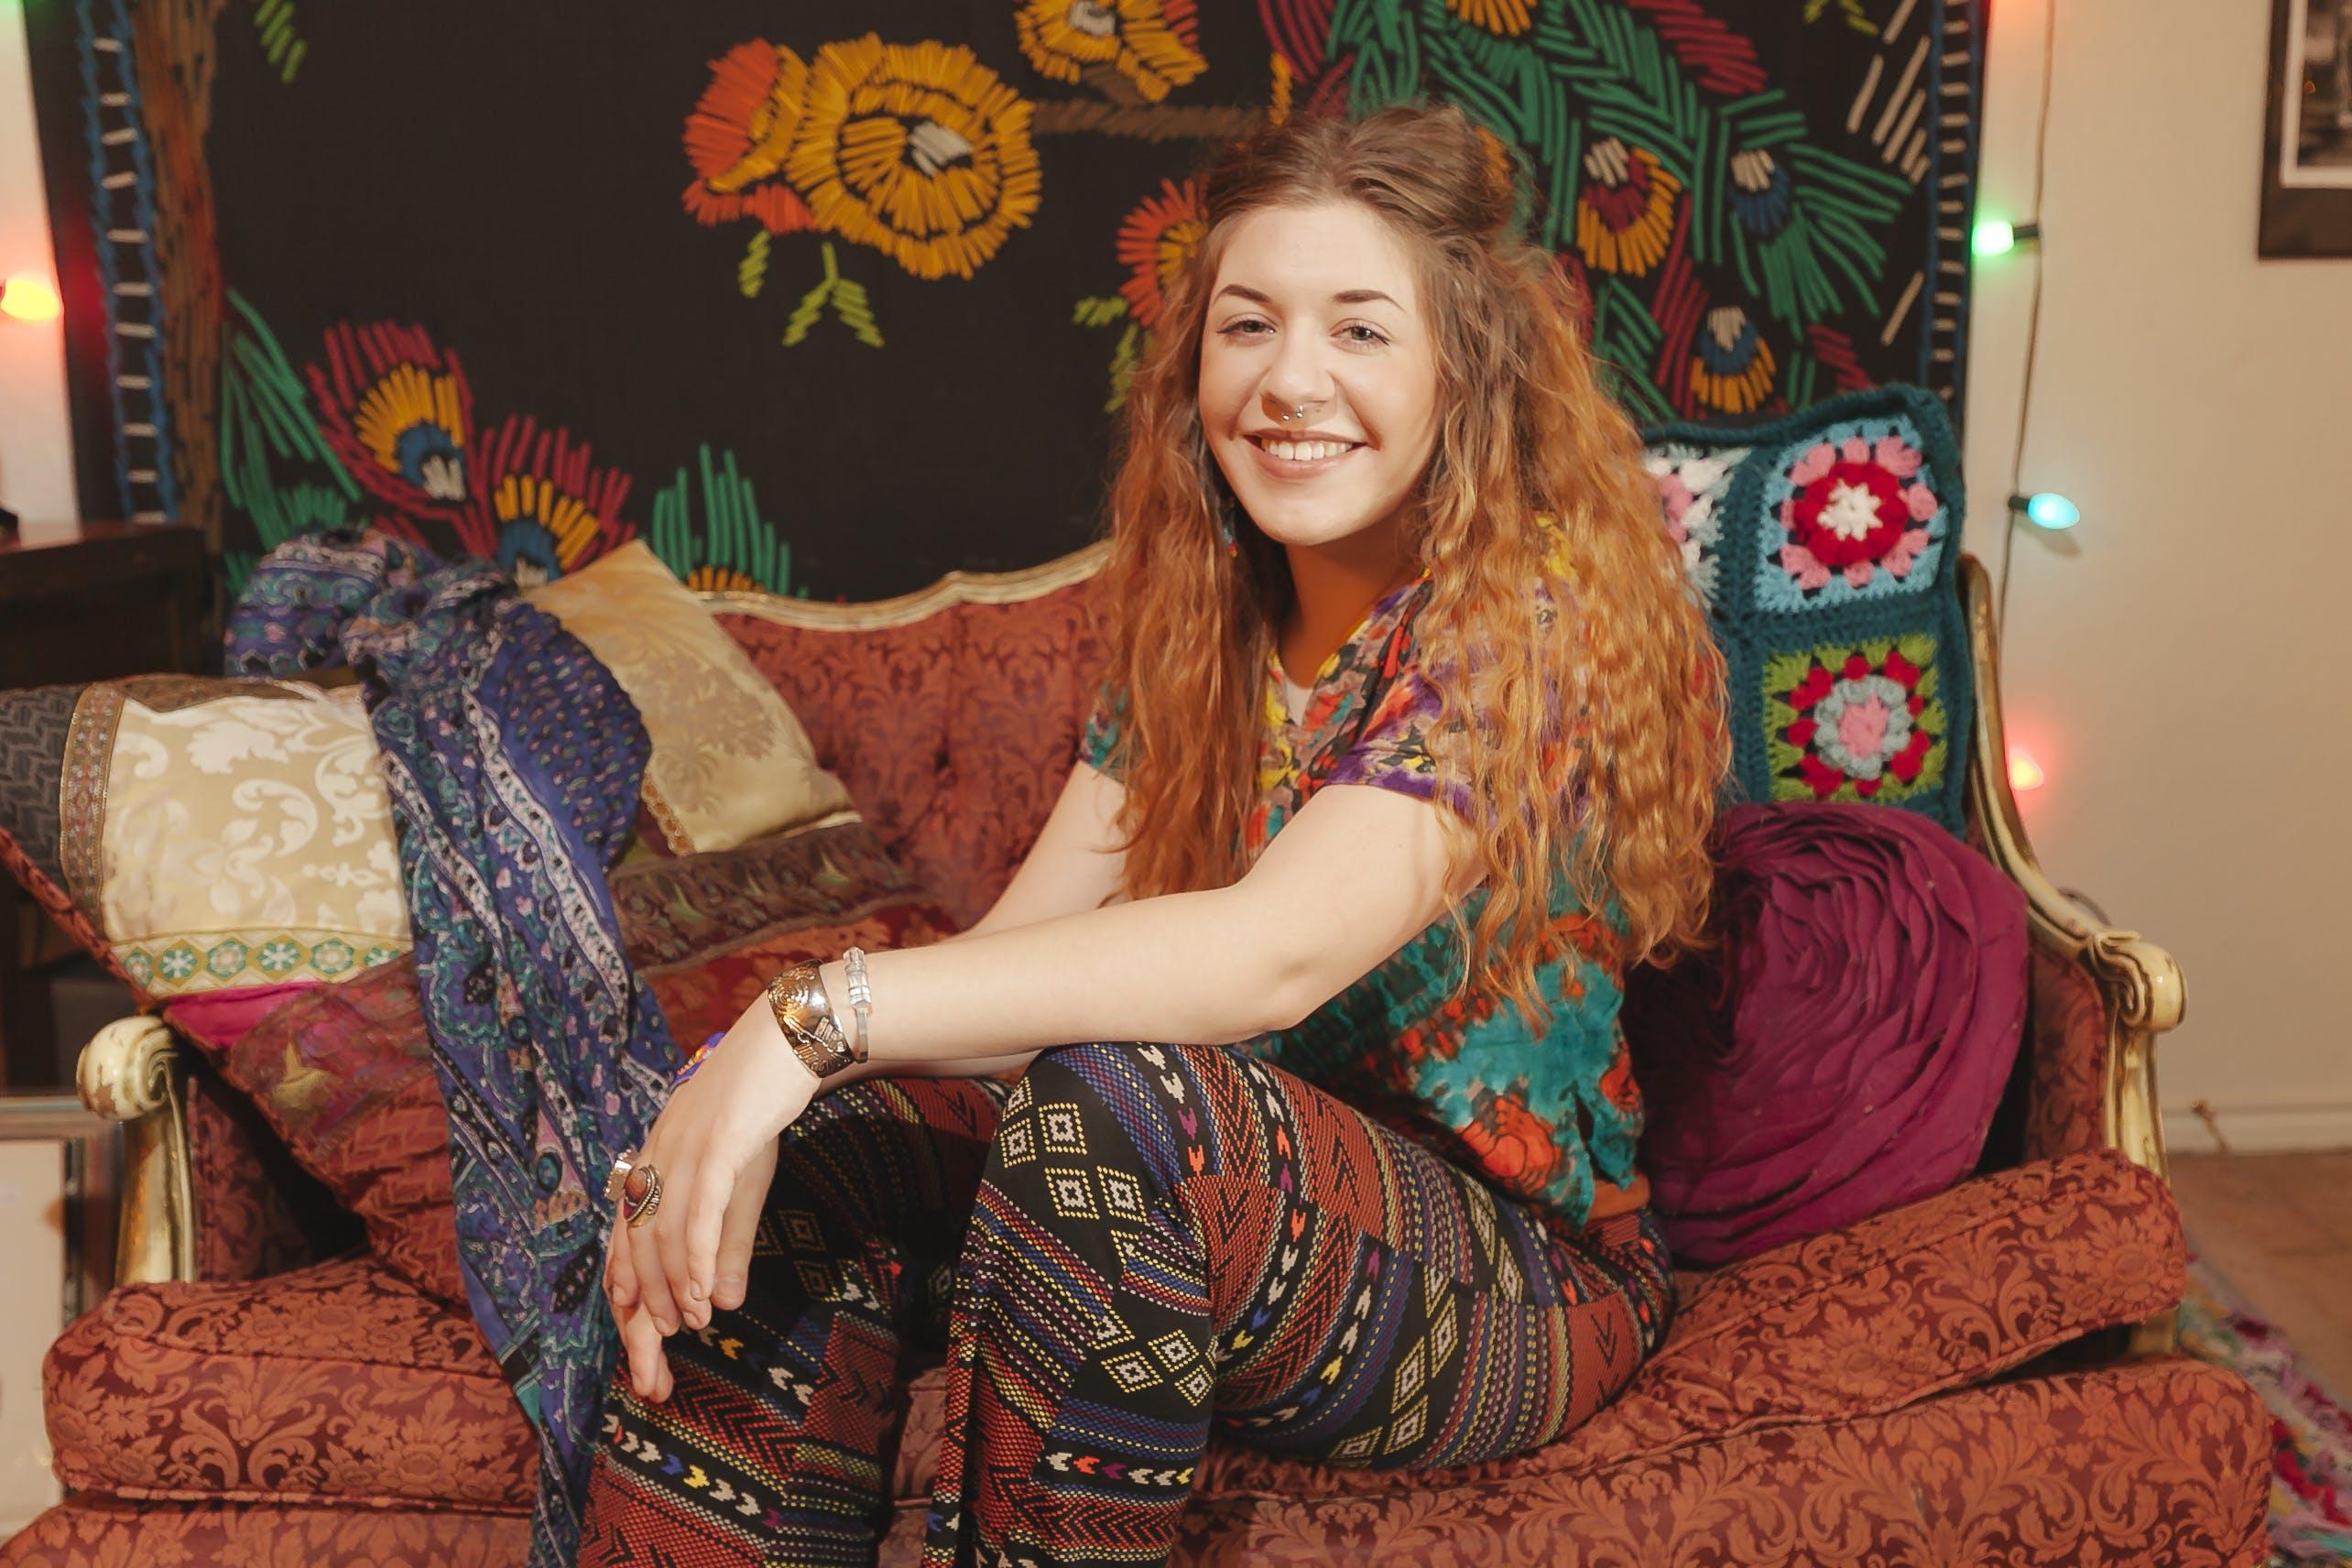 Woman Sitting On Sofa Smiling